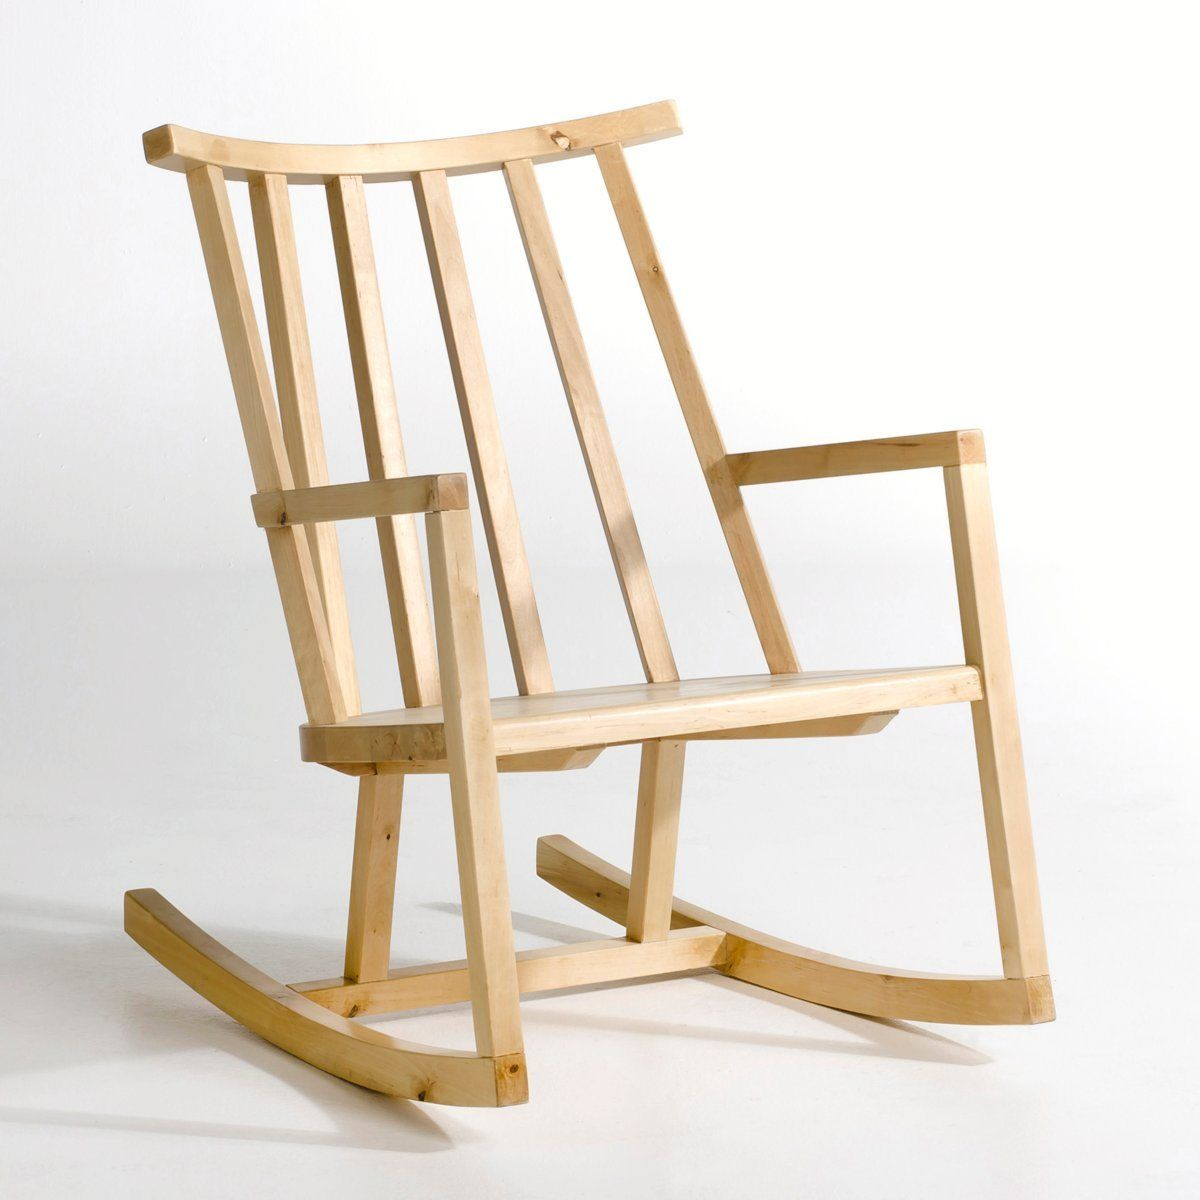 } 0113 Chair Mobilier De • Salon SlowAm pm 299{ P17b Rocking OTPXZiuk